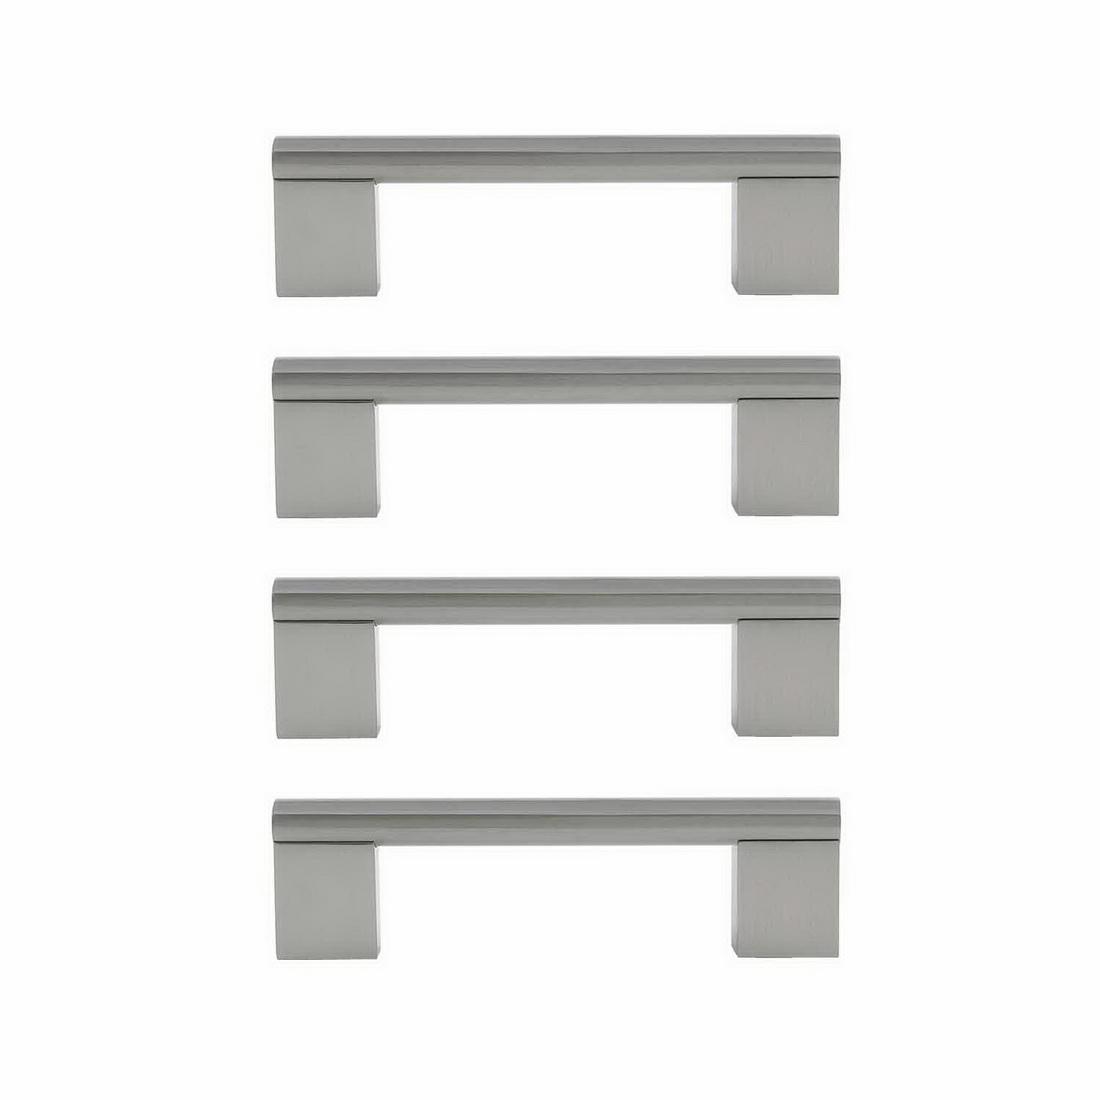 Minerva Cabinet Handle 128mm Zinc Die-Cast Brushed Nickel 4 pack 6314-4-BN